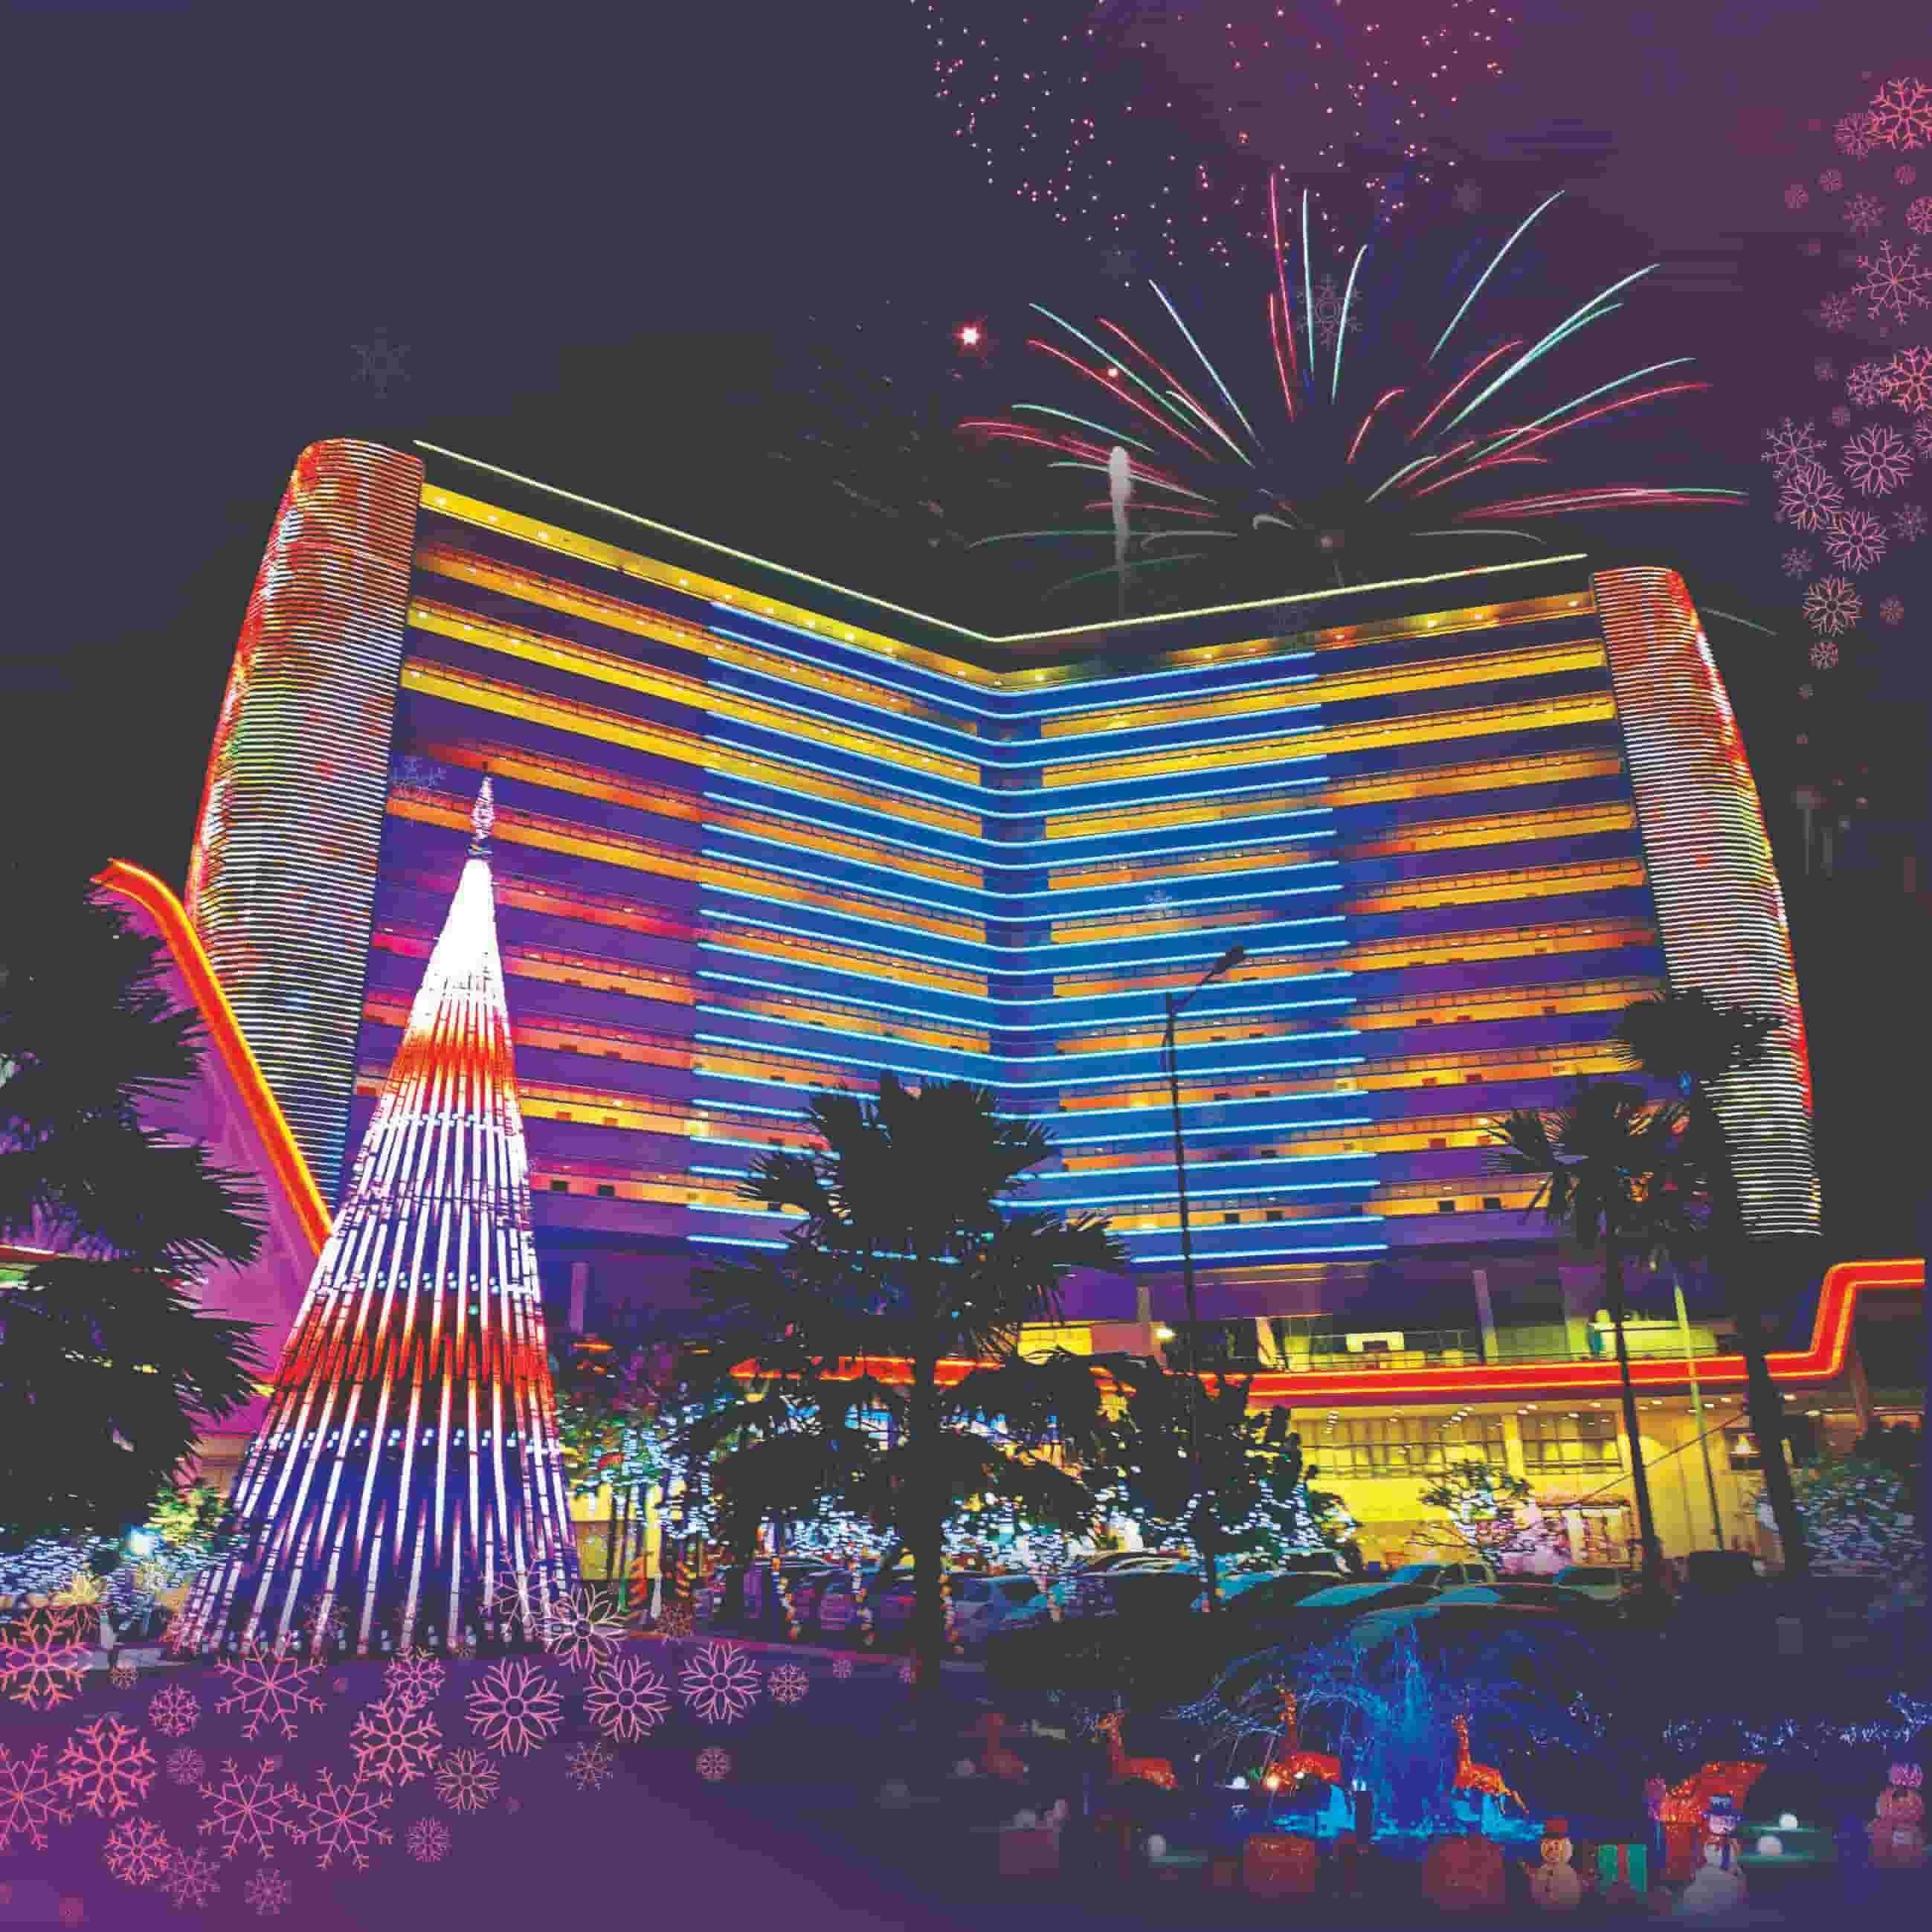 News 2019 - Christmas Decorations | Lexis Hibiscus® Port Dickson